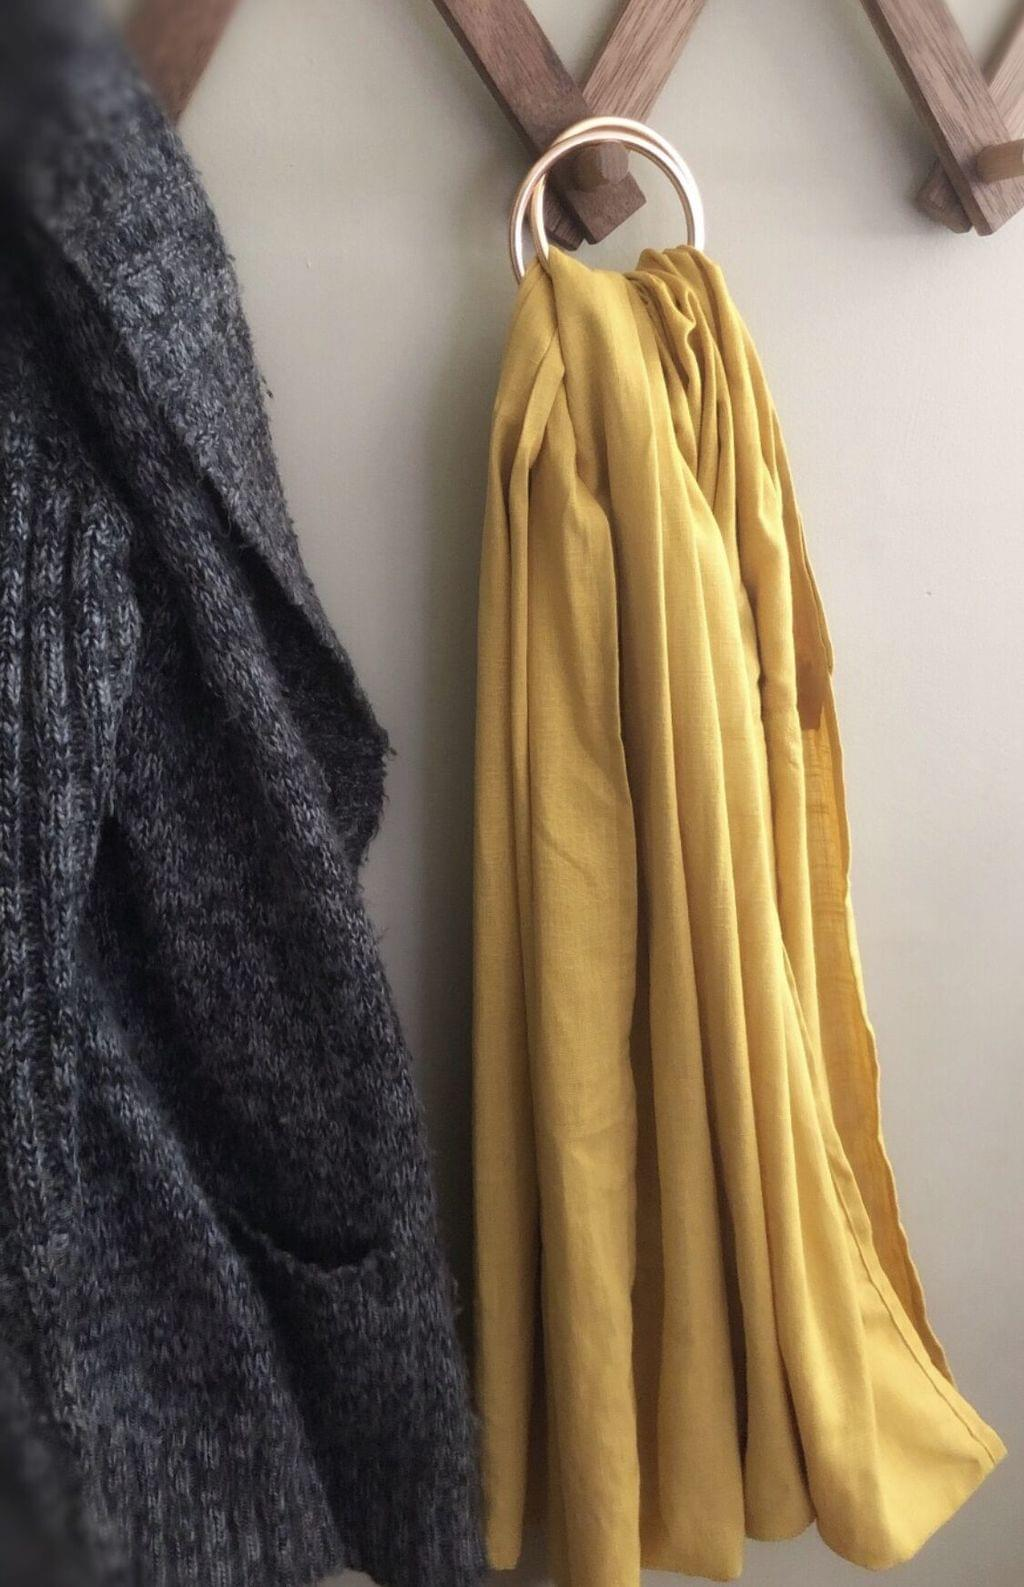 c460e8b336a Mustard Linen Ring Sling    Ankalia Textiles